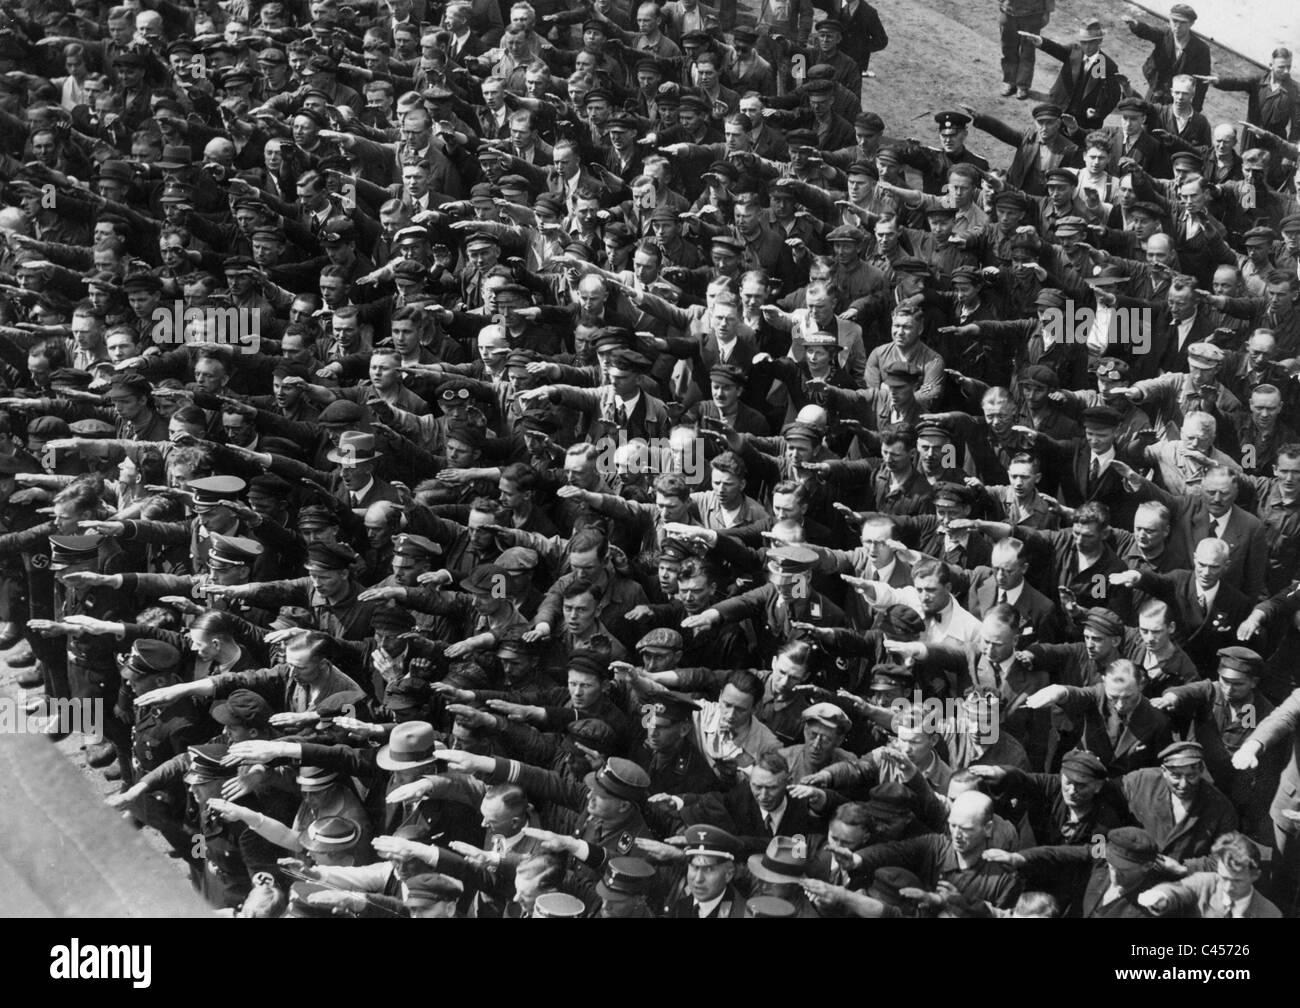 refusal-to-the-nazi-salute-1936-C45726.j